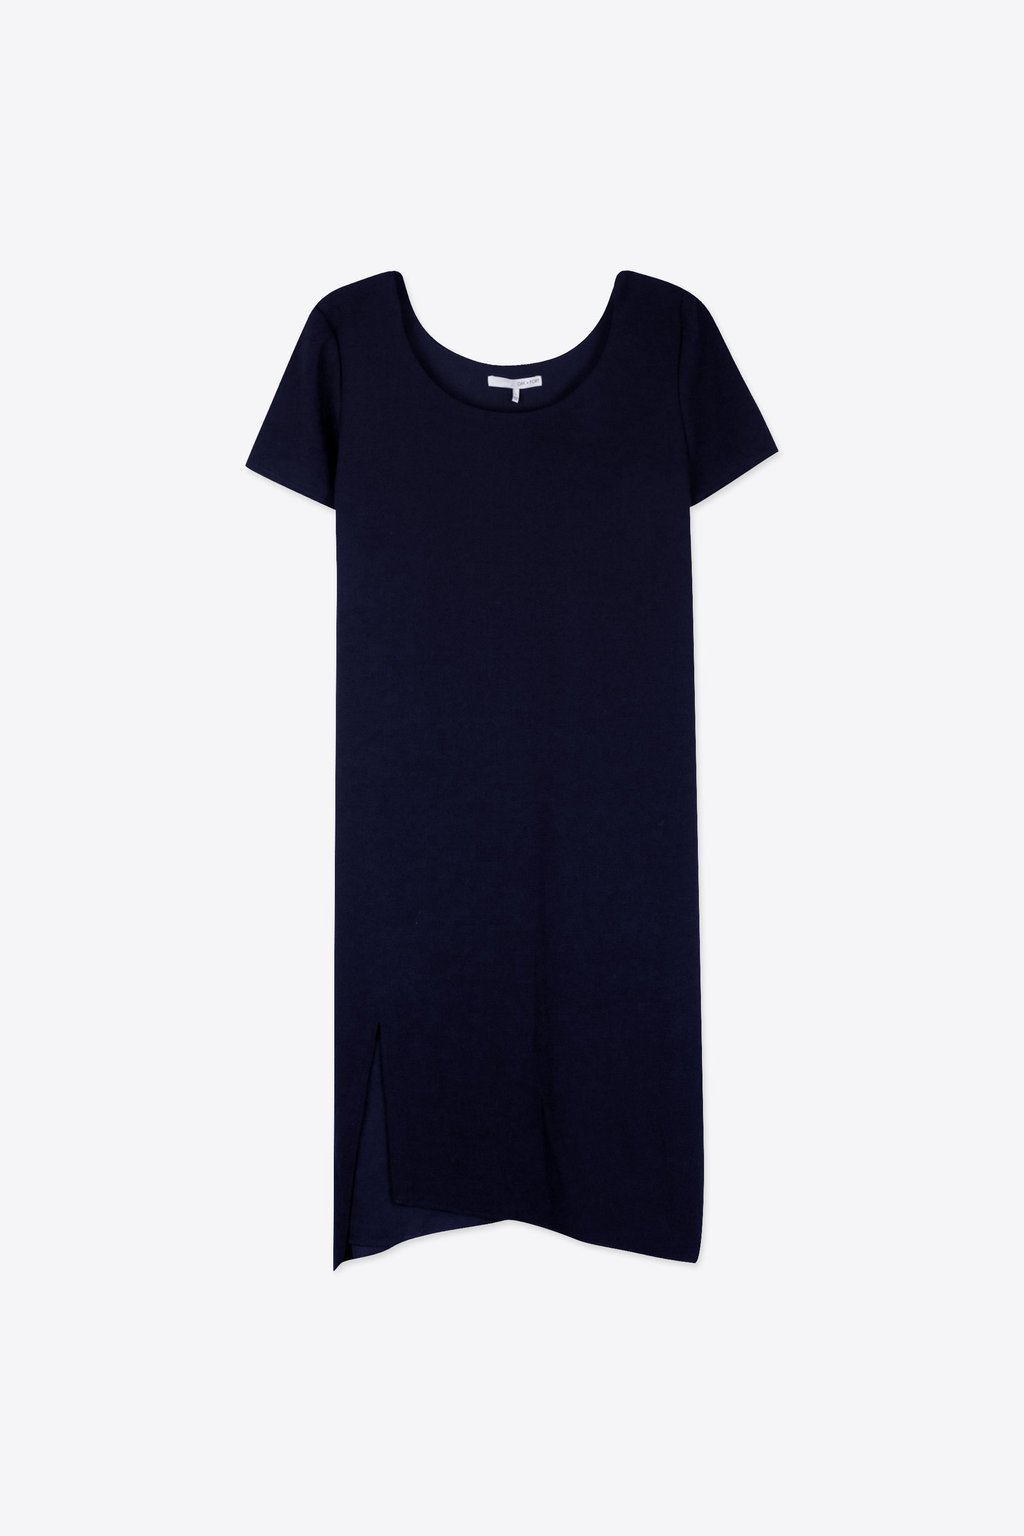 Dress 1203 Navy 5